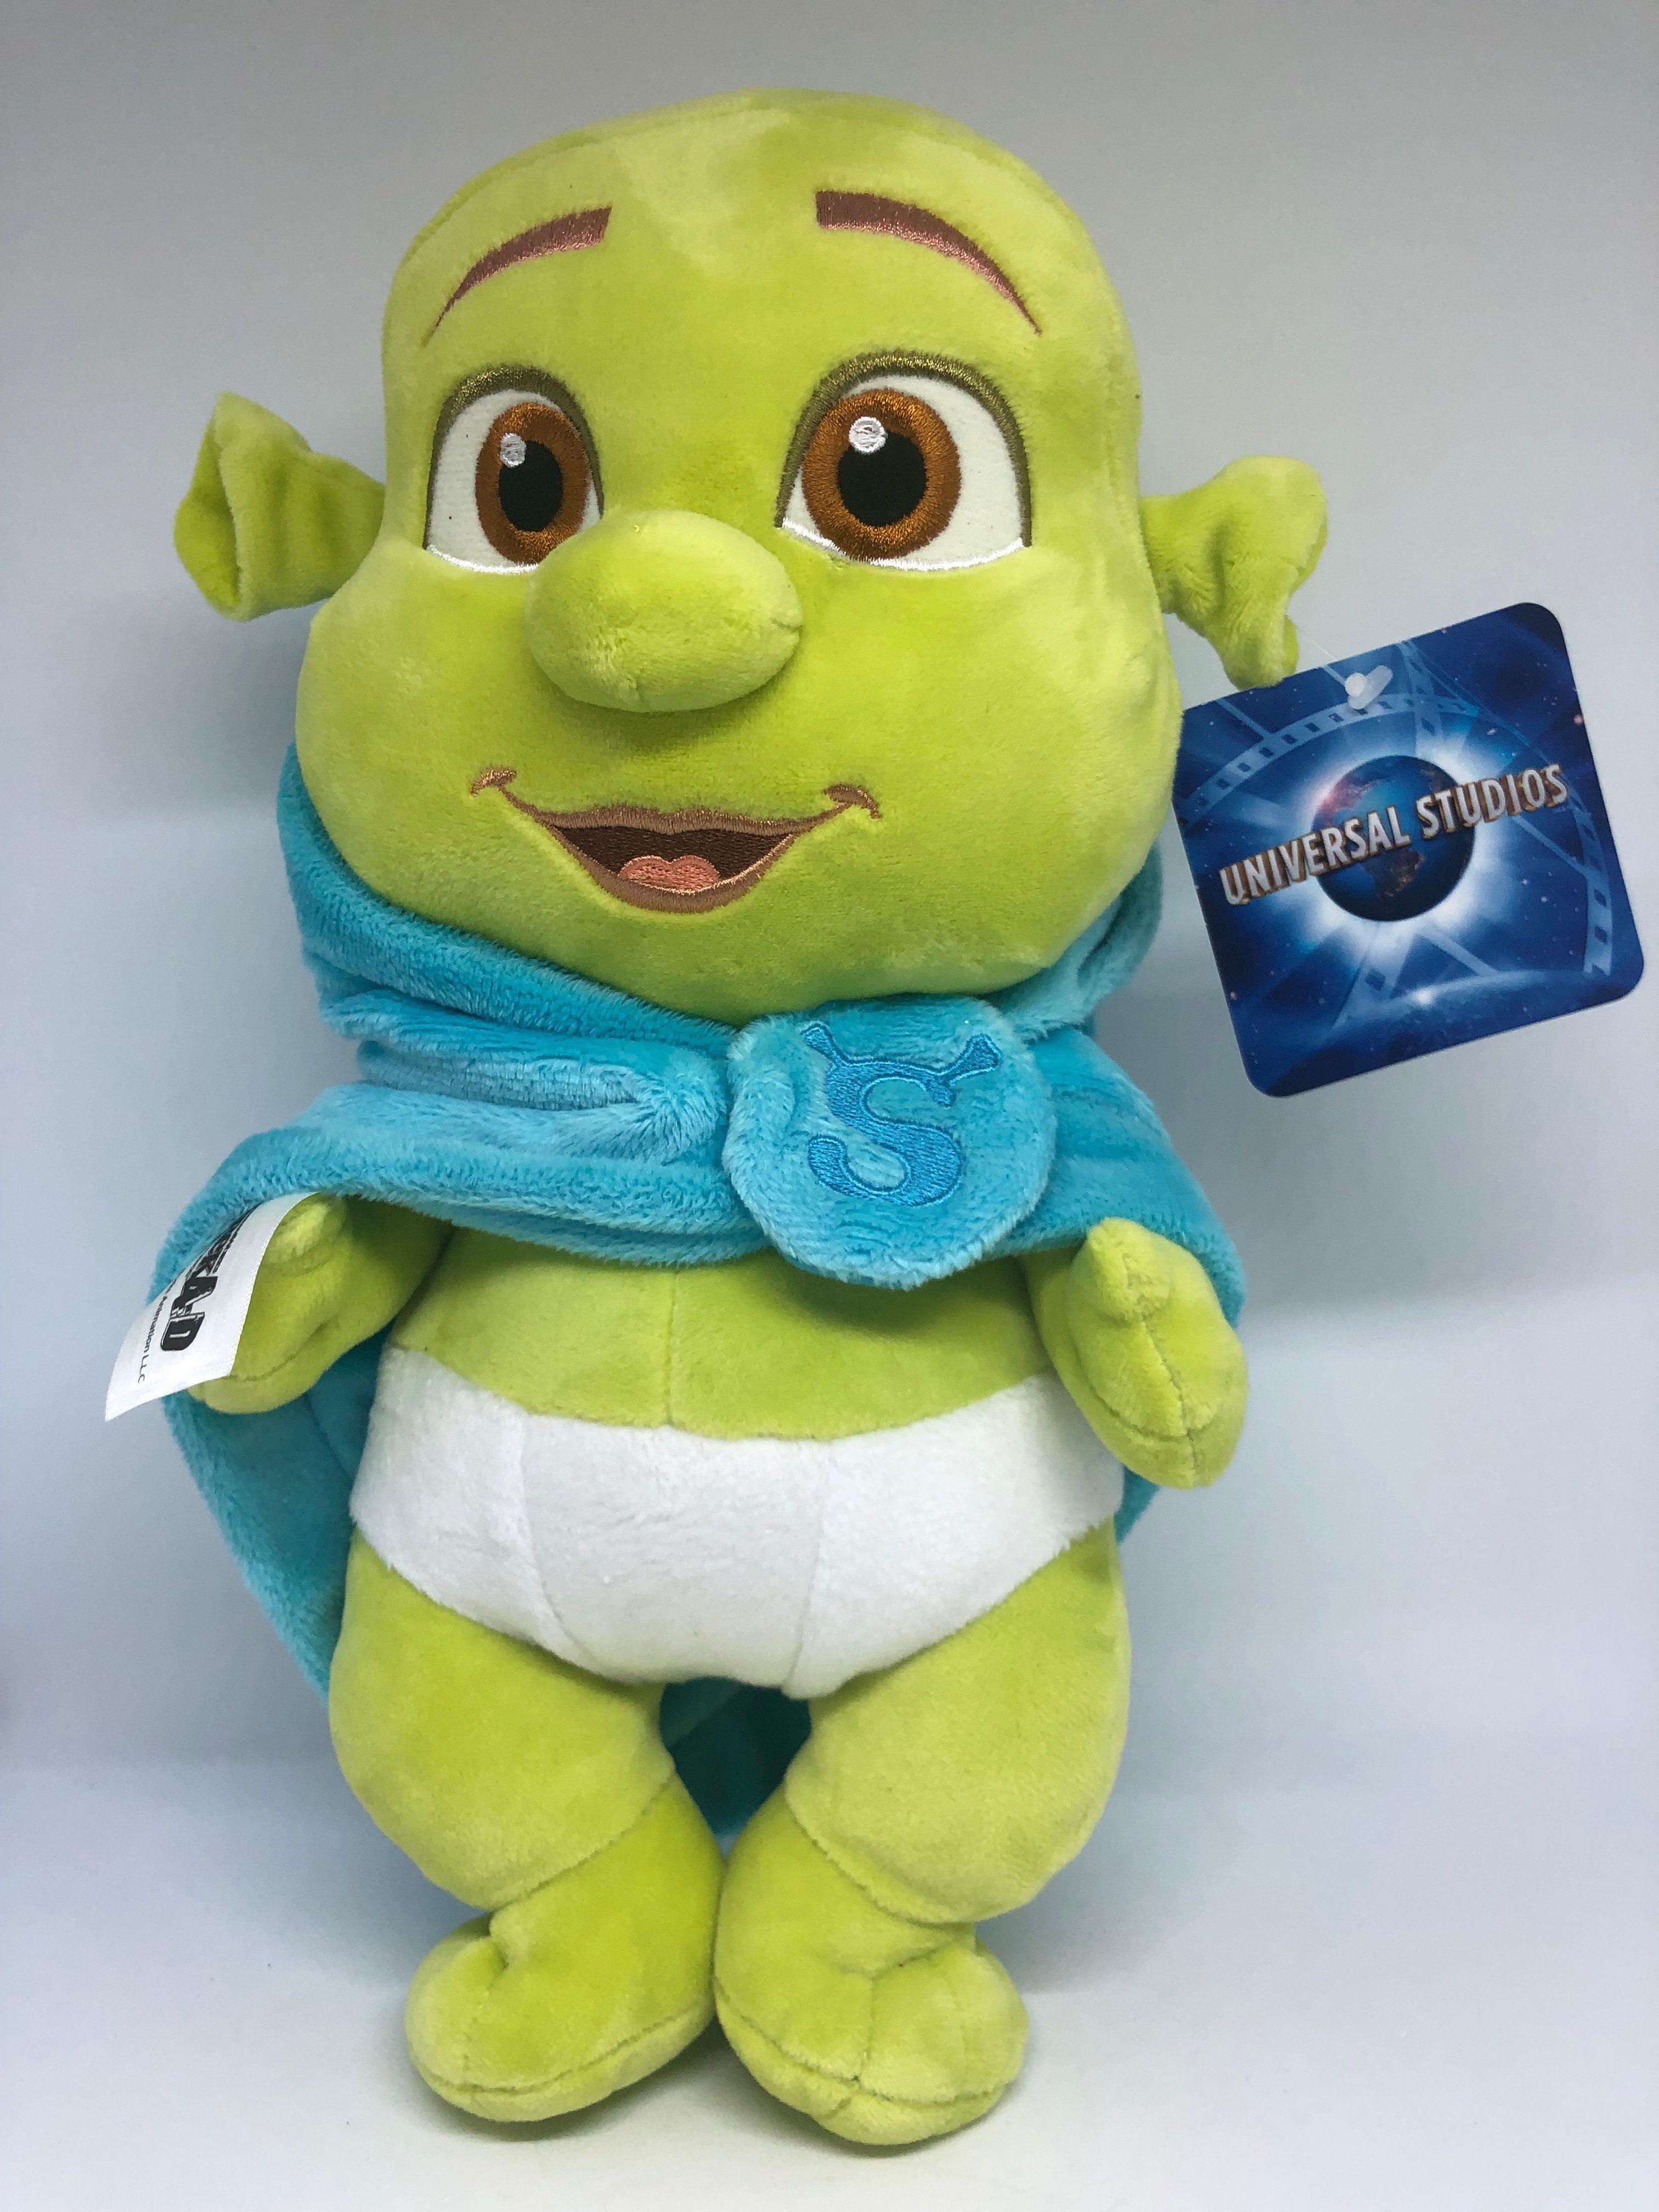 Universal Studios Shrek 4 D Baby Boy In Blanket Plush New